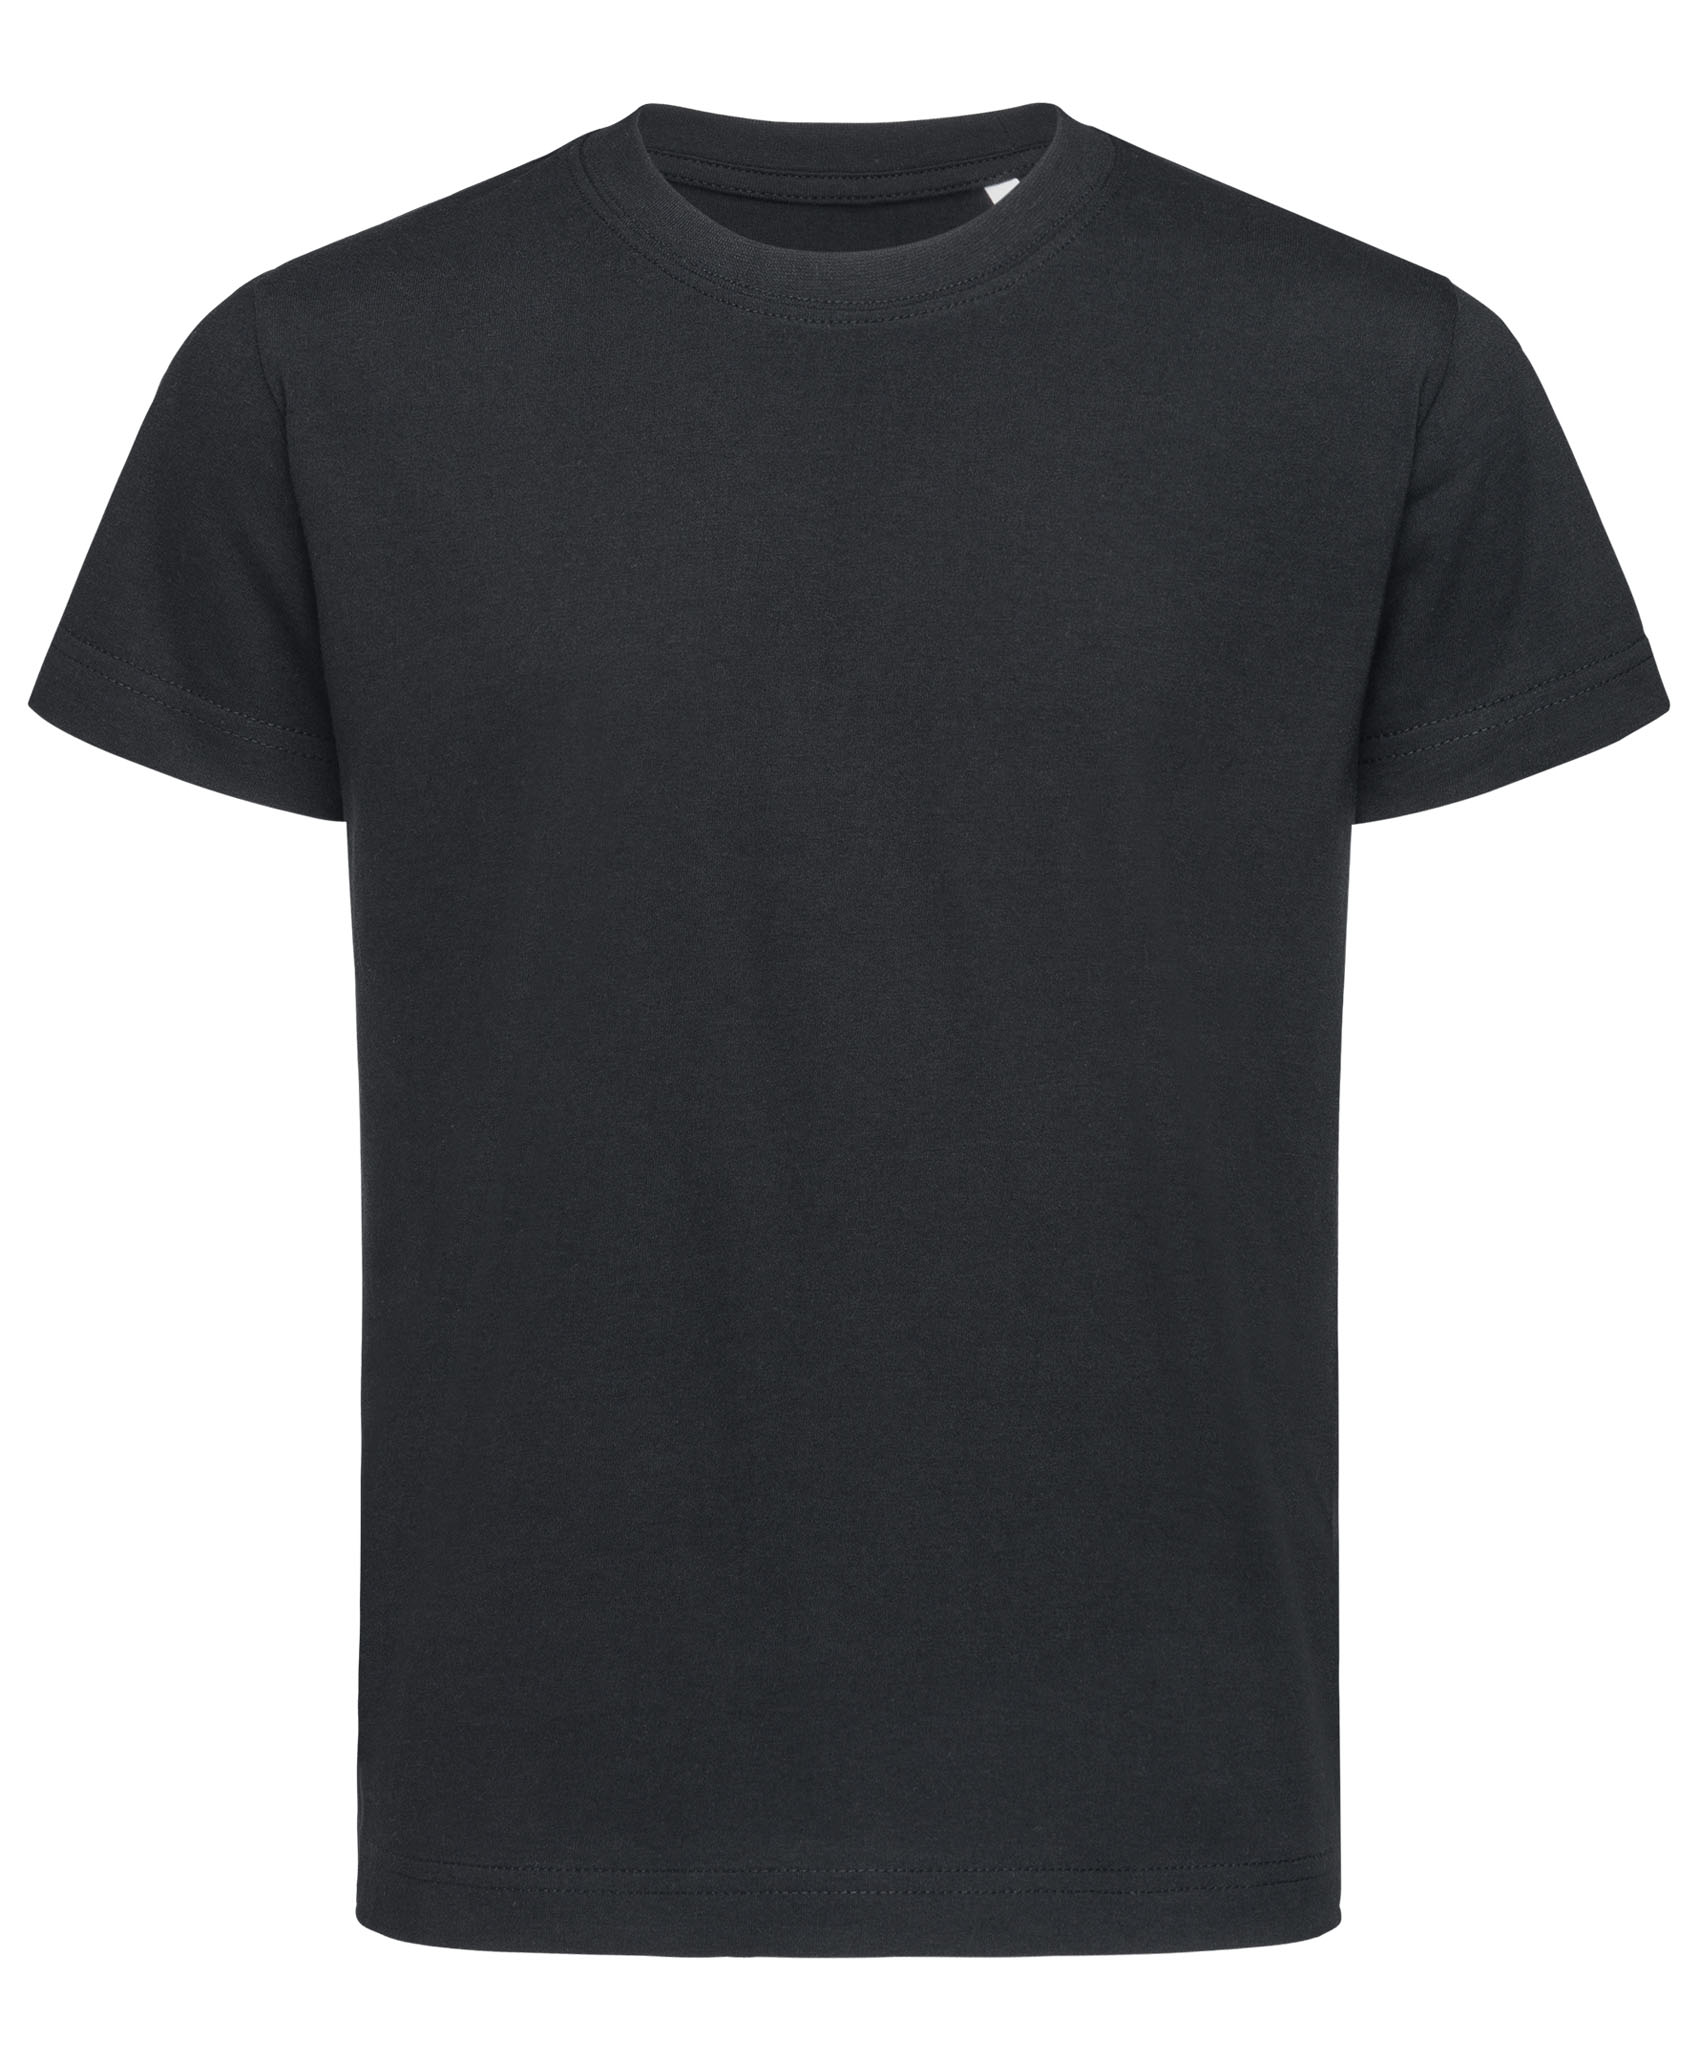 Stedman T-shirt Crewneck Jamie for kids